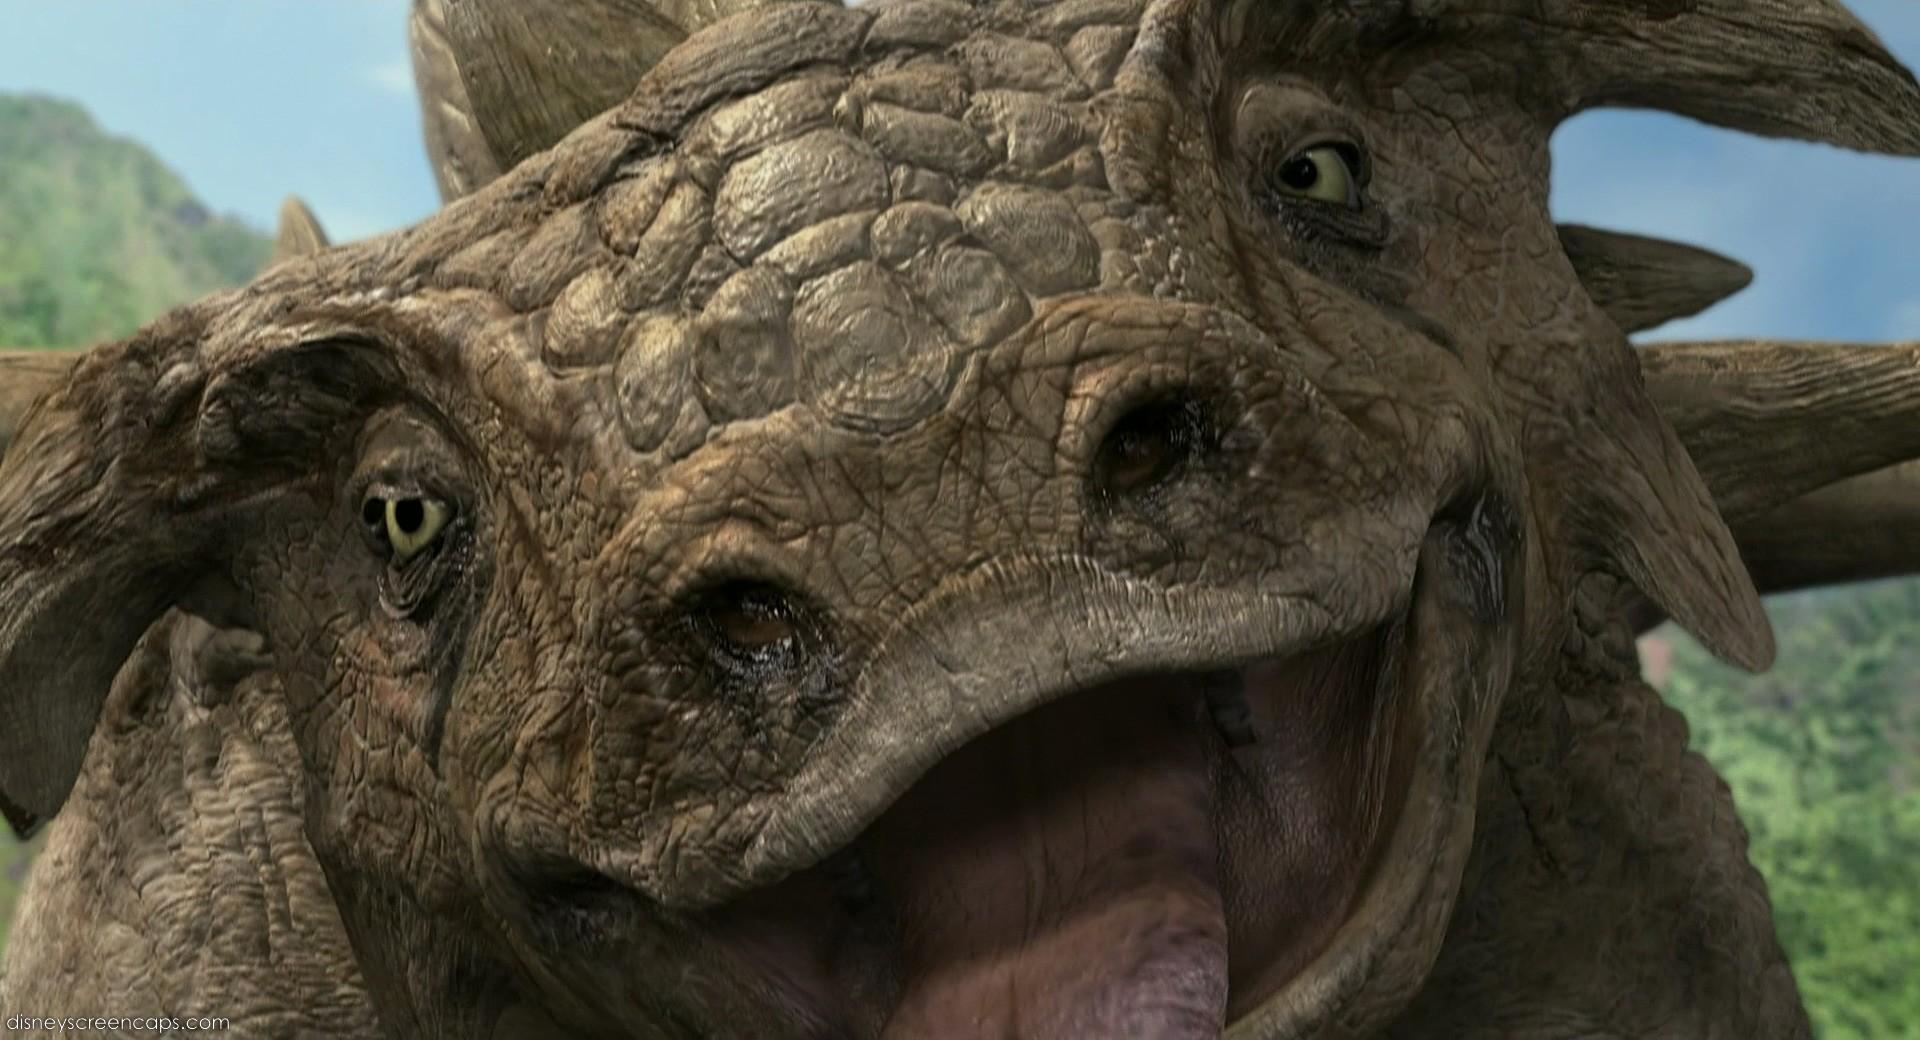 Dinosaur_Url-disneyscreencaps_com-7324.j